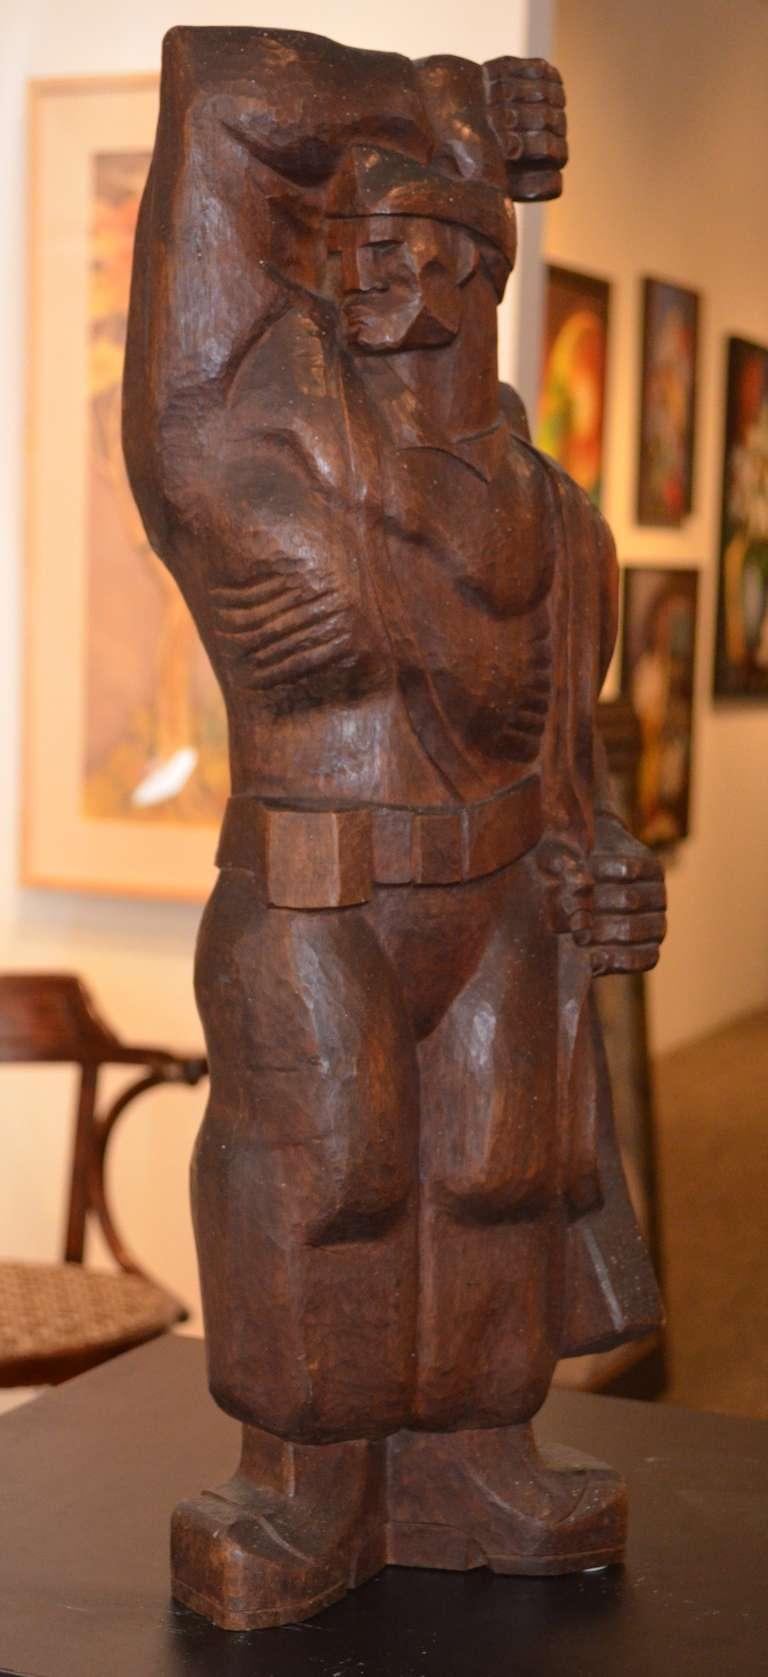 Burton Freund Figurative Sculpture - The Partisan